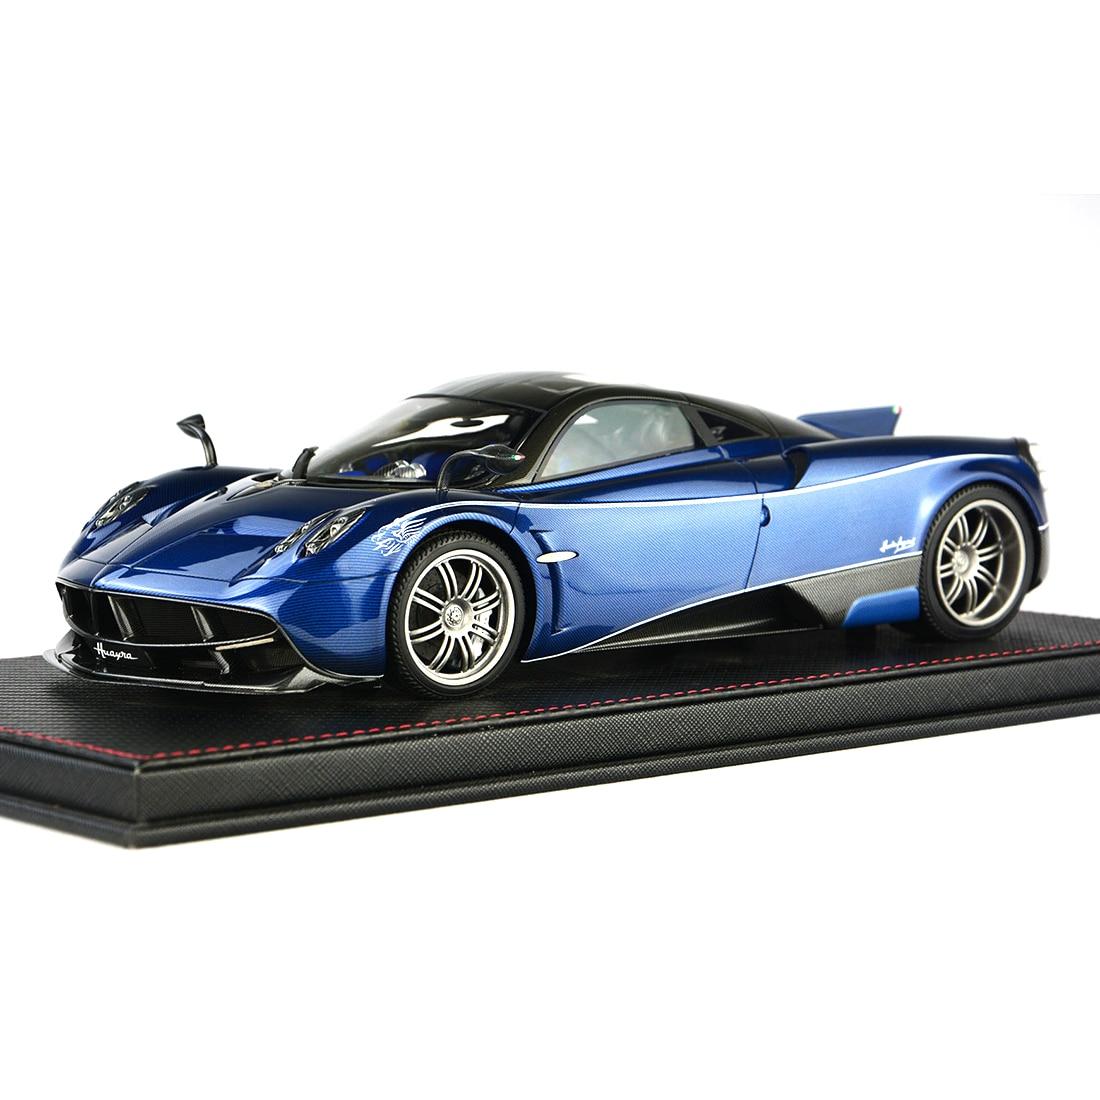 1:18 Auto Model Pagani Huayra Model Collection Decor Met Base Stofkap Model Educatief Speelgoed Blauw/Charcoal Grey /Paars Rood - 4